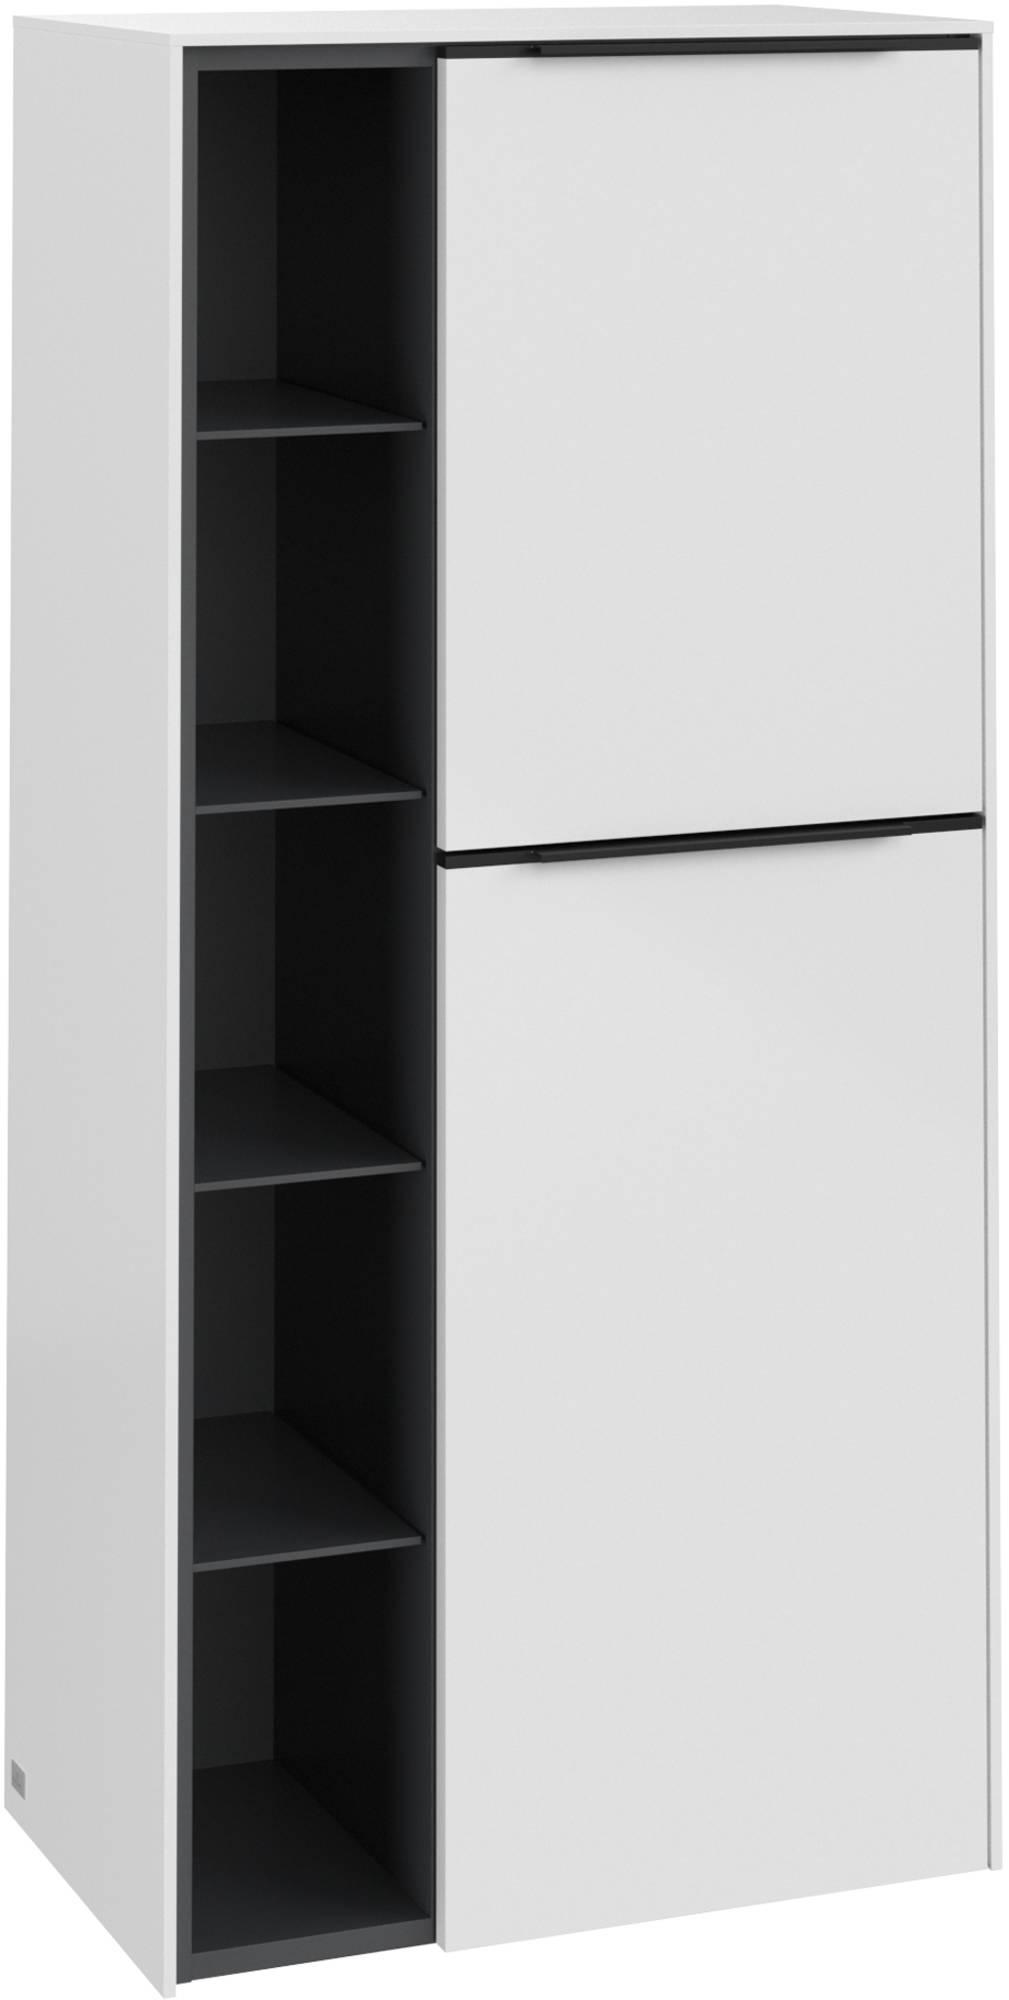 Villeroy & Boch Subway 3.0 Middenkast 57,4x36,2x120 cm Brilliant White